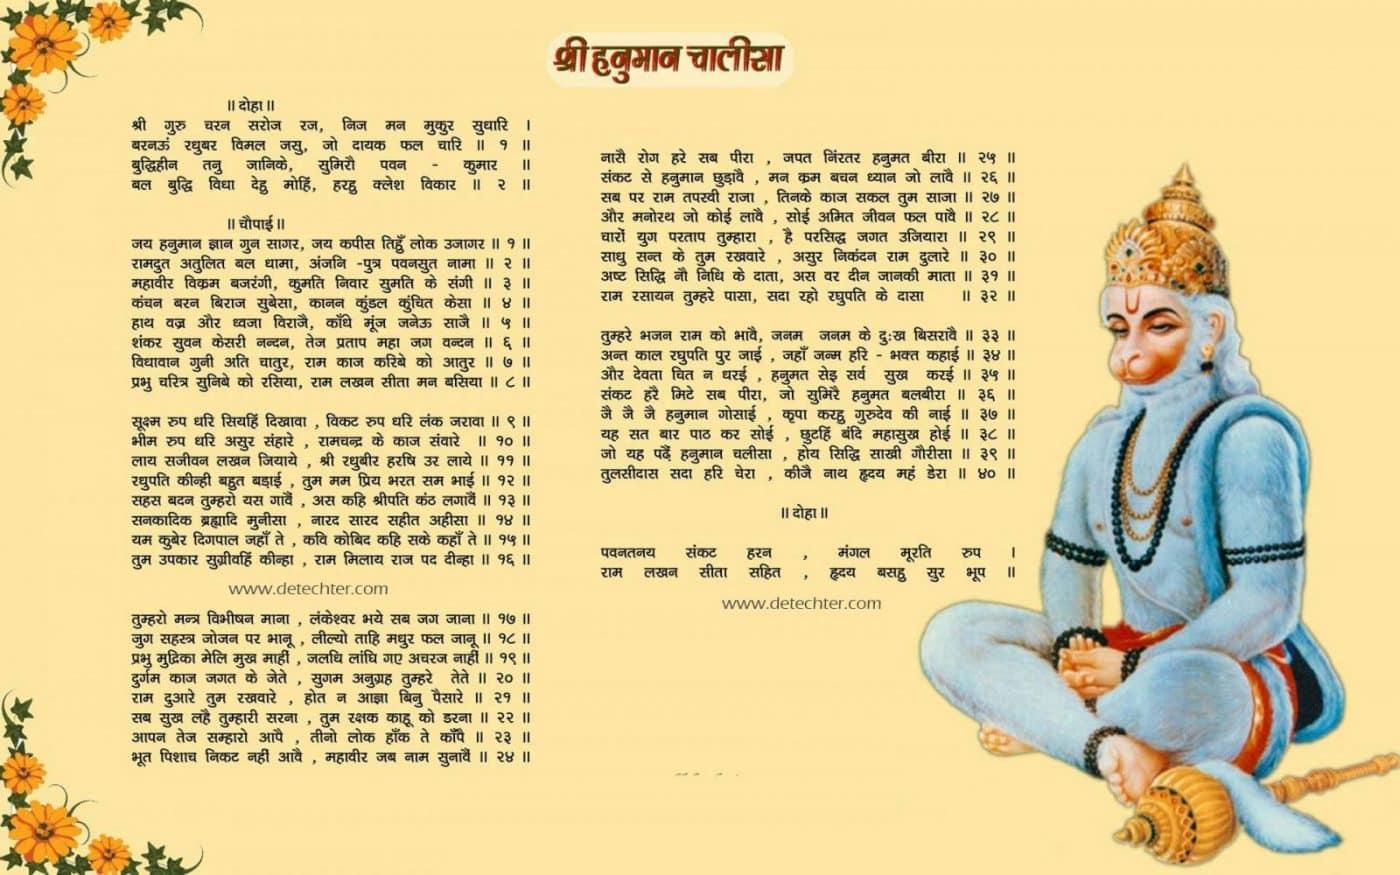 Hanuman Chalisa Lyrics in Hindi and English With Meaning